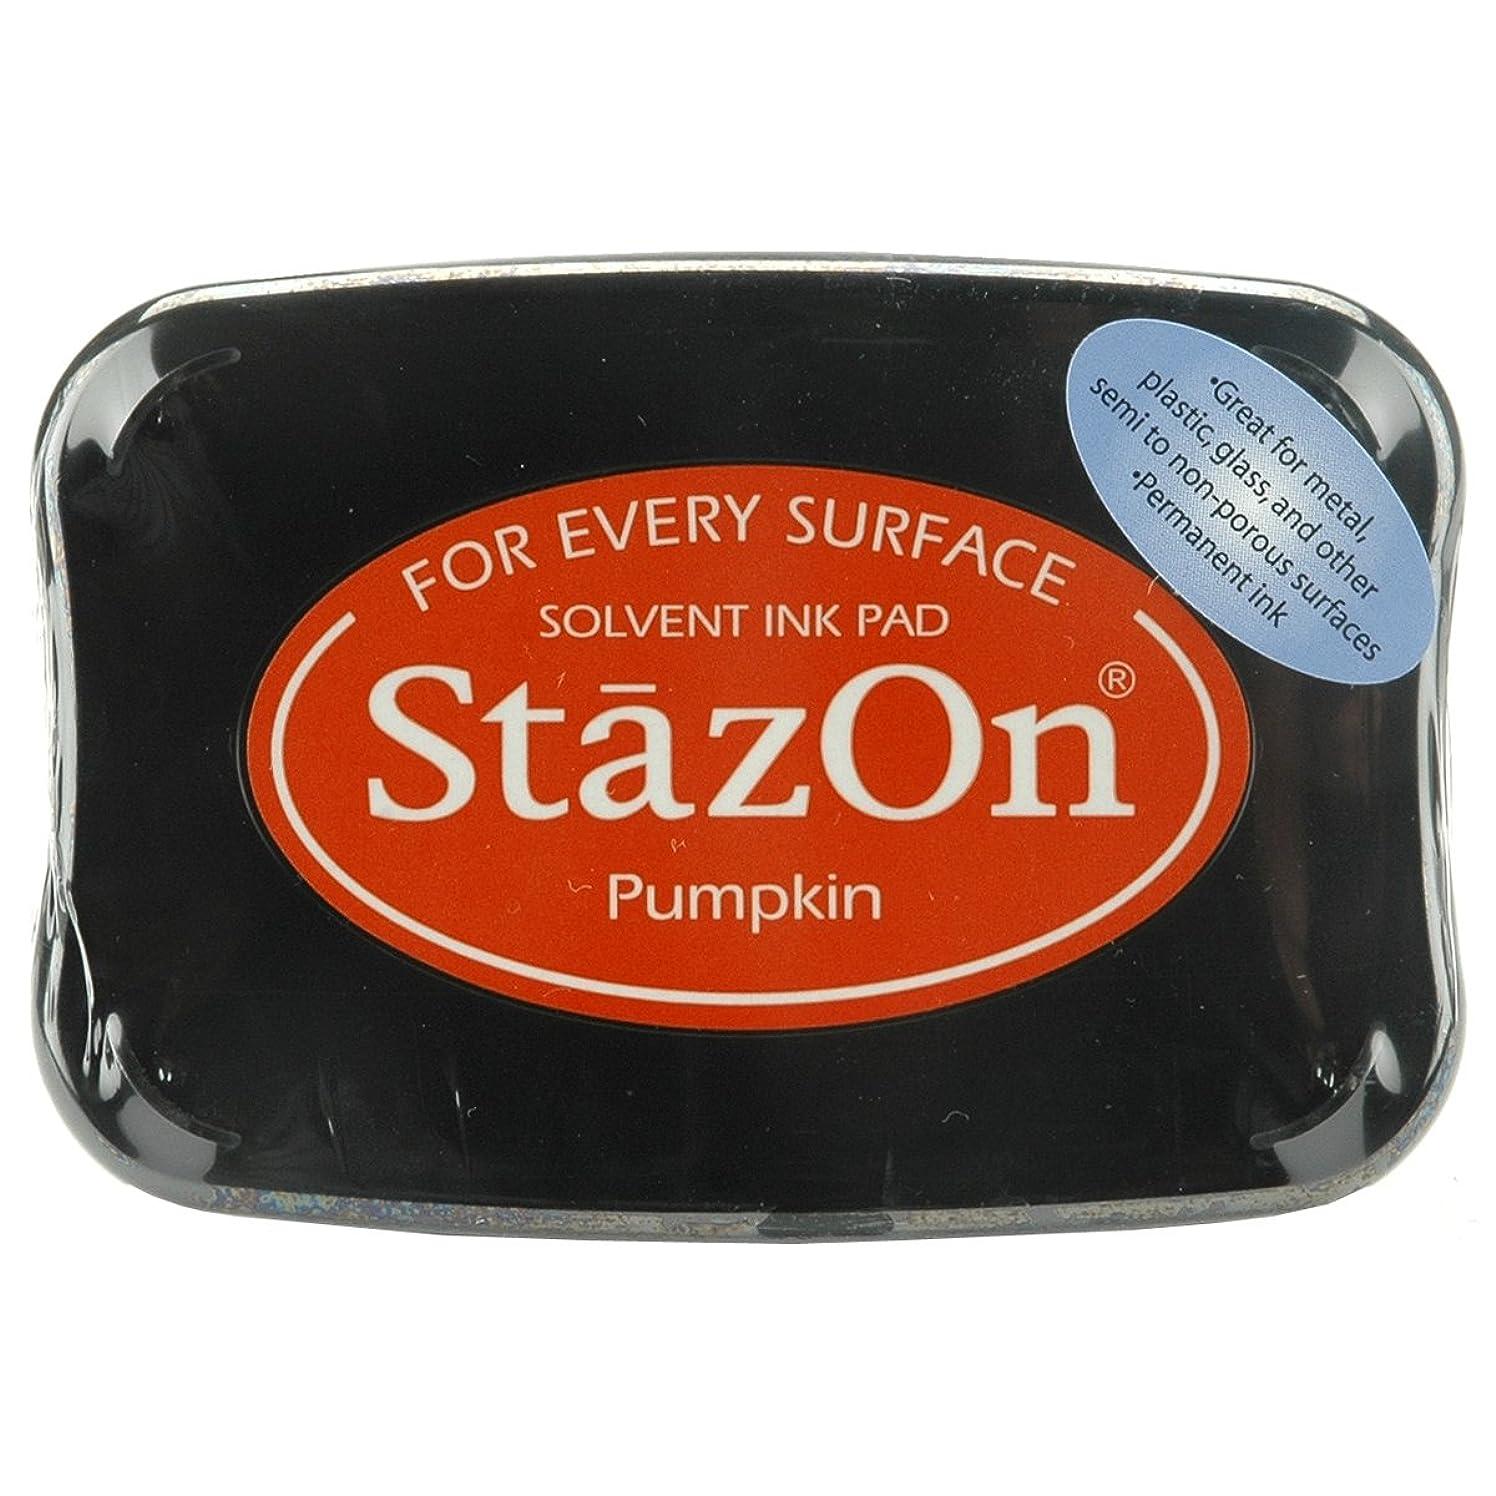 Tsukineko, StazOn, Full Size Ink Pad, Pumpkin